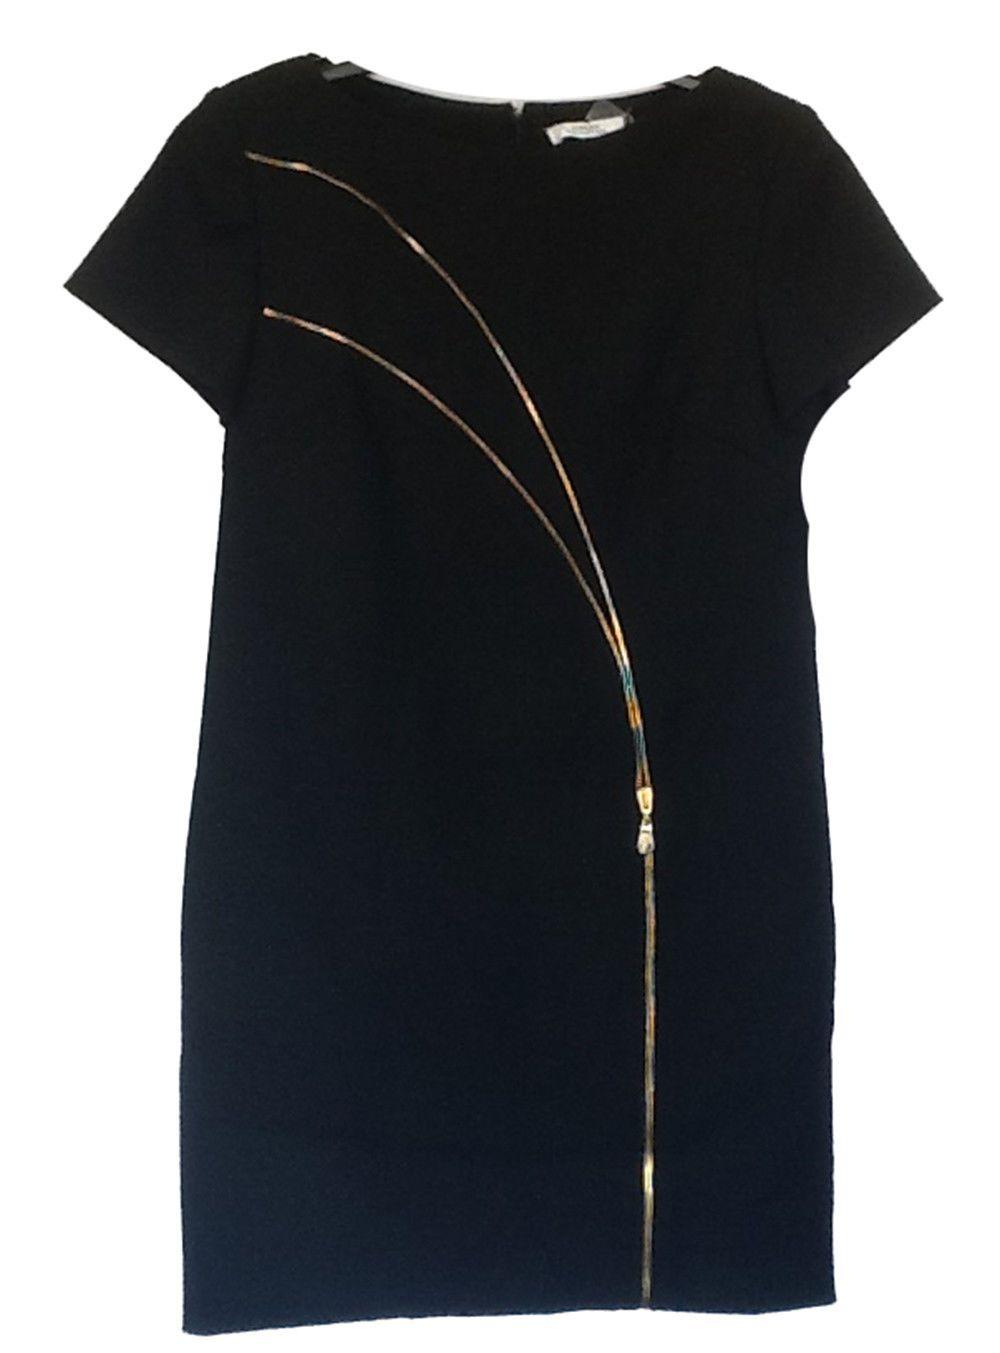 87e9baf9d5ff34 249.99   Versace Collection Womens Pointe Sheath Dress with Gold Zipper  Front Black 42 ❤ #versace #collection #womens #pointe #sheath #zipper #zara  #ASOS ...